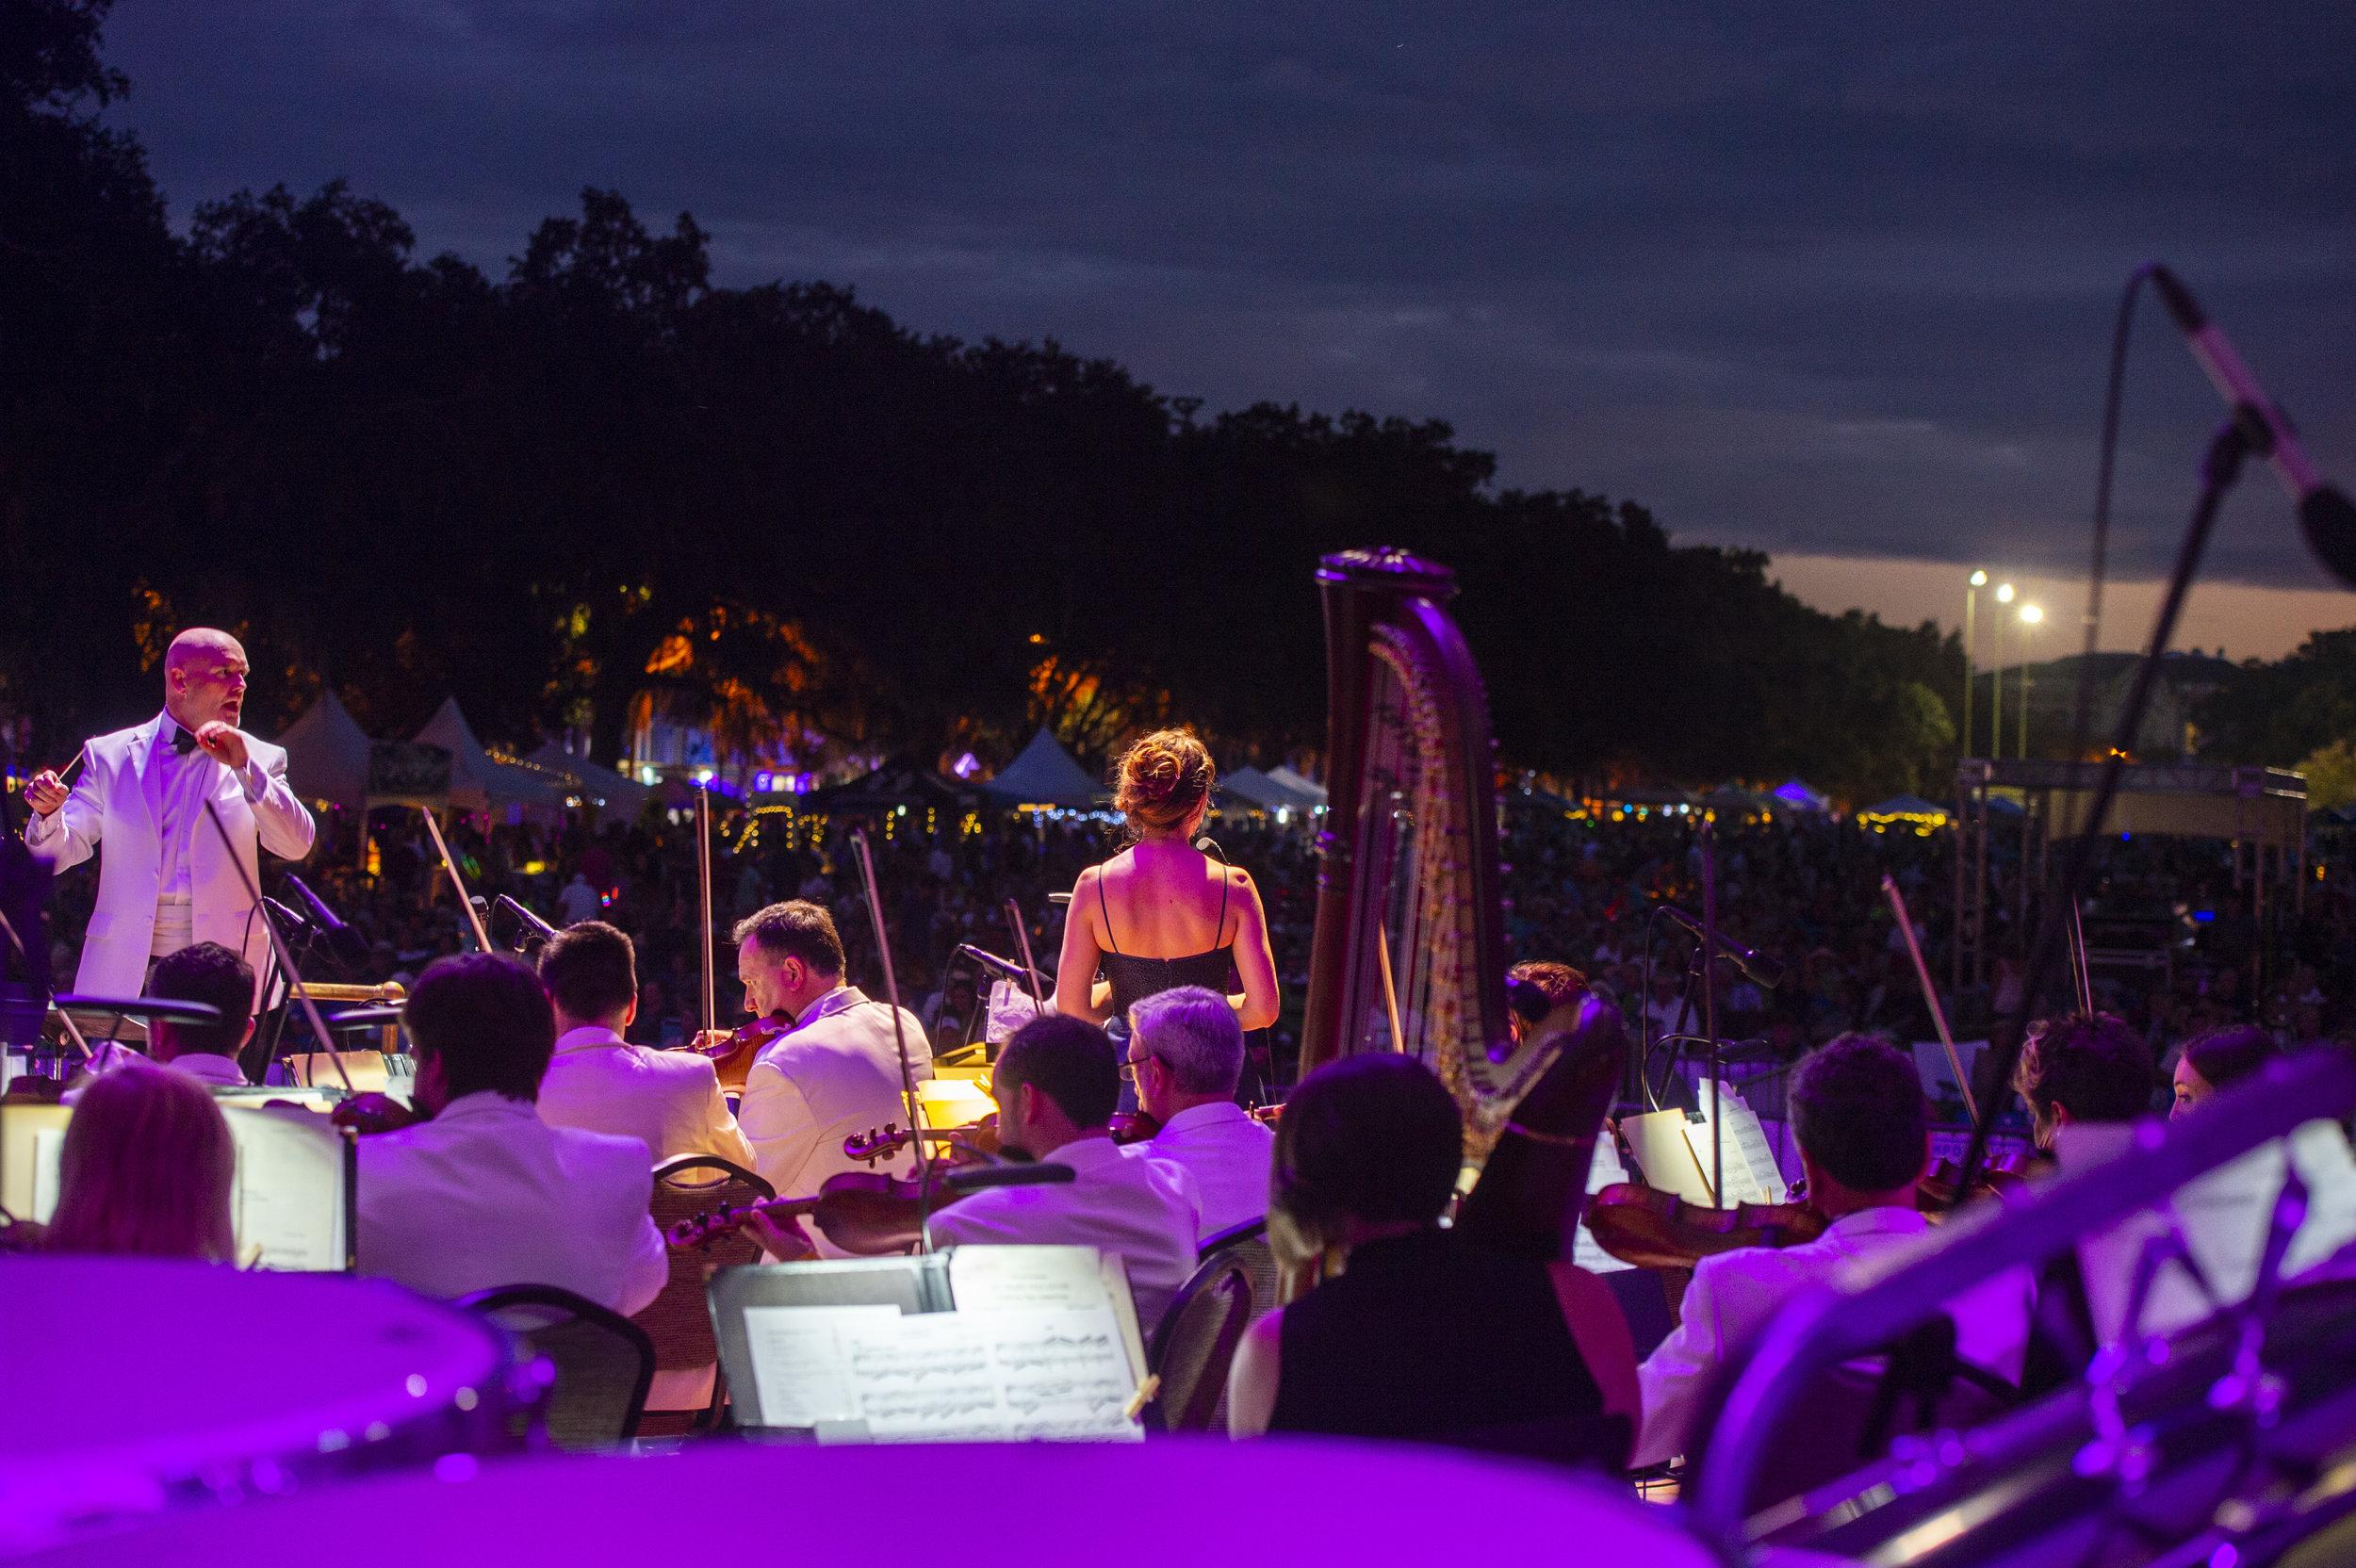 Geoff L Johnson - Picnic in the Park, Savannah Philharmonic